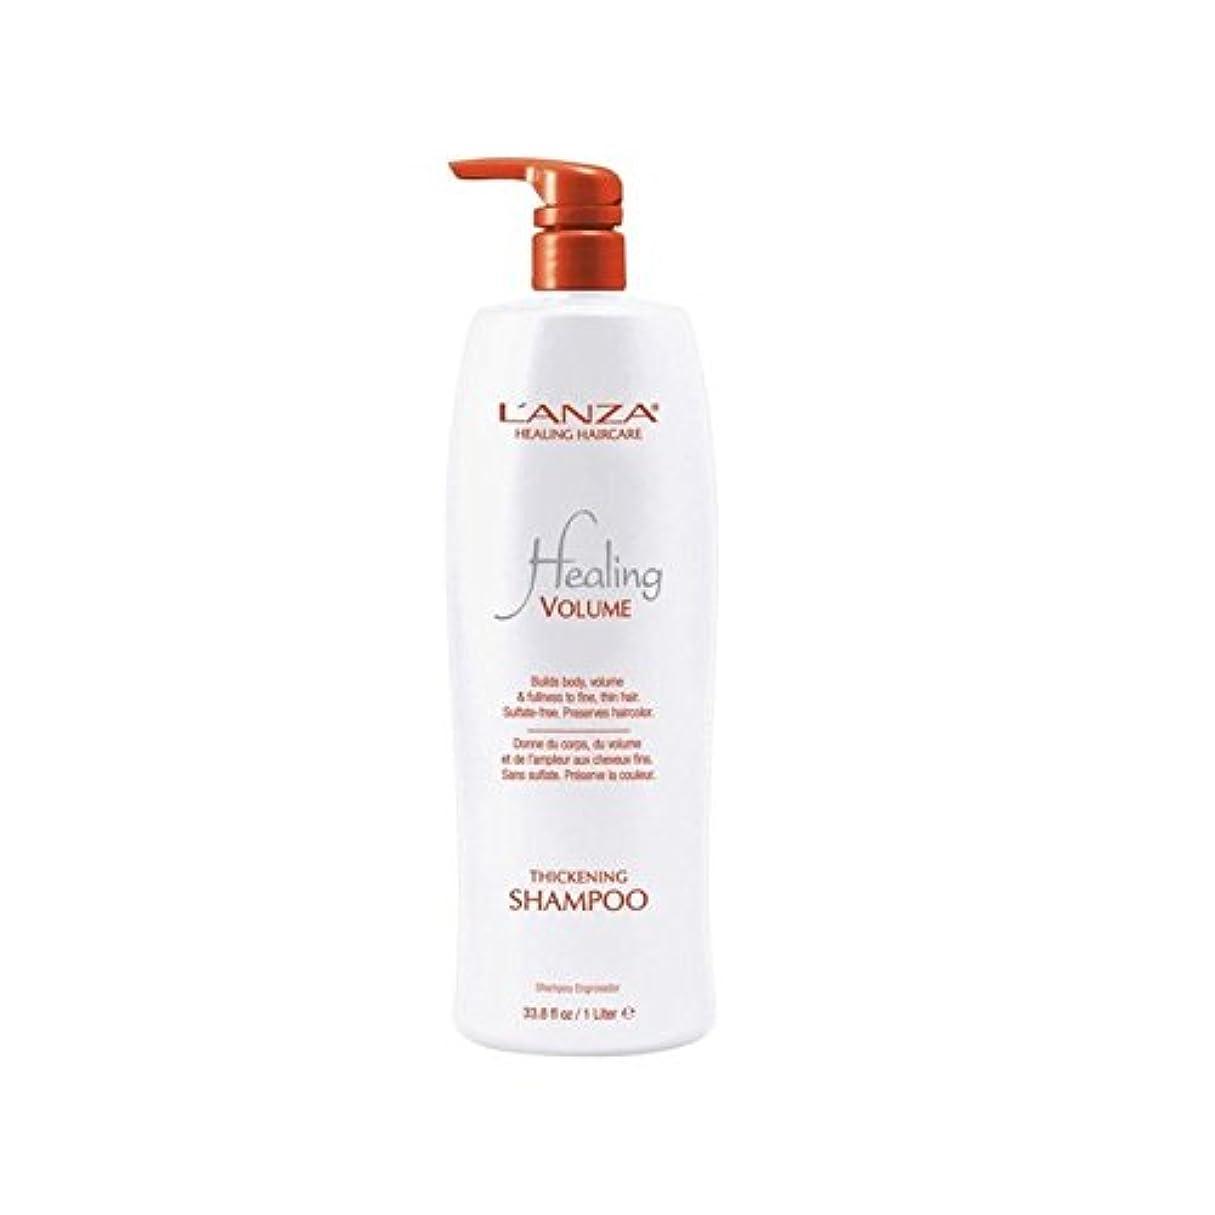 Lanza Healing Volume Thickening Shampoo (1000ml) - ランツァ癒しのボリューム肥厚シャンプー(千ミリリットル) [並行輸入品]